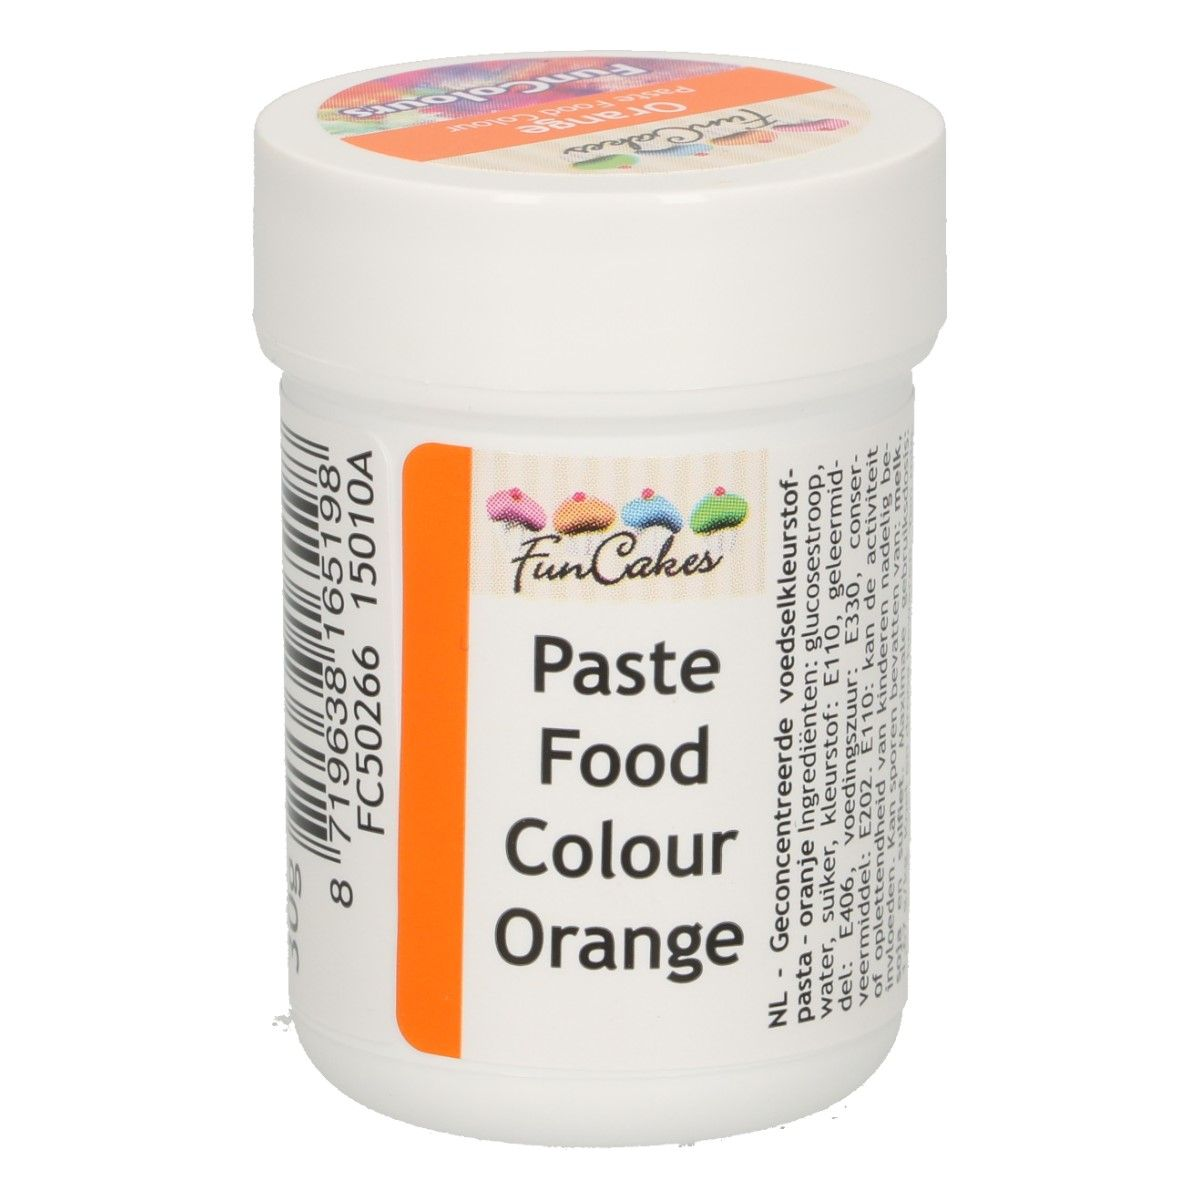 Colorant alimentaire en gel 30 g – Orange